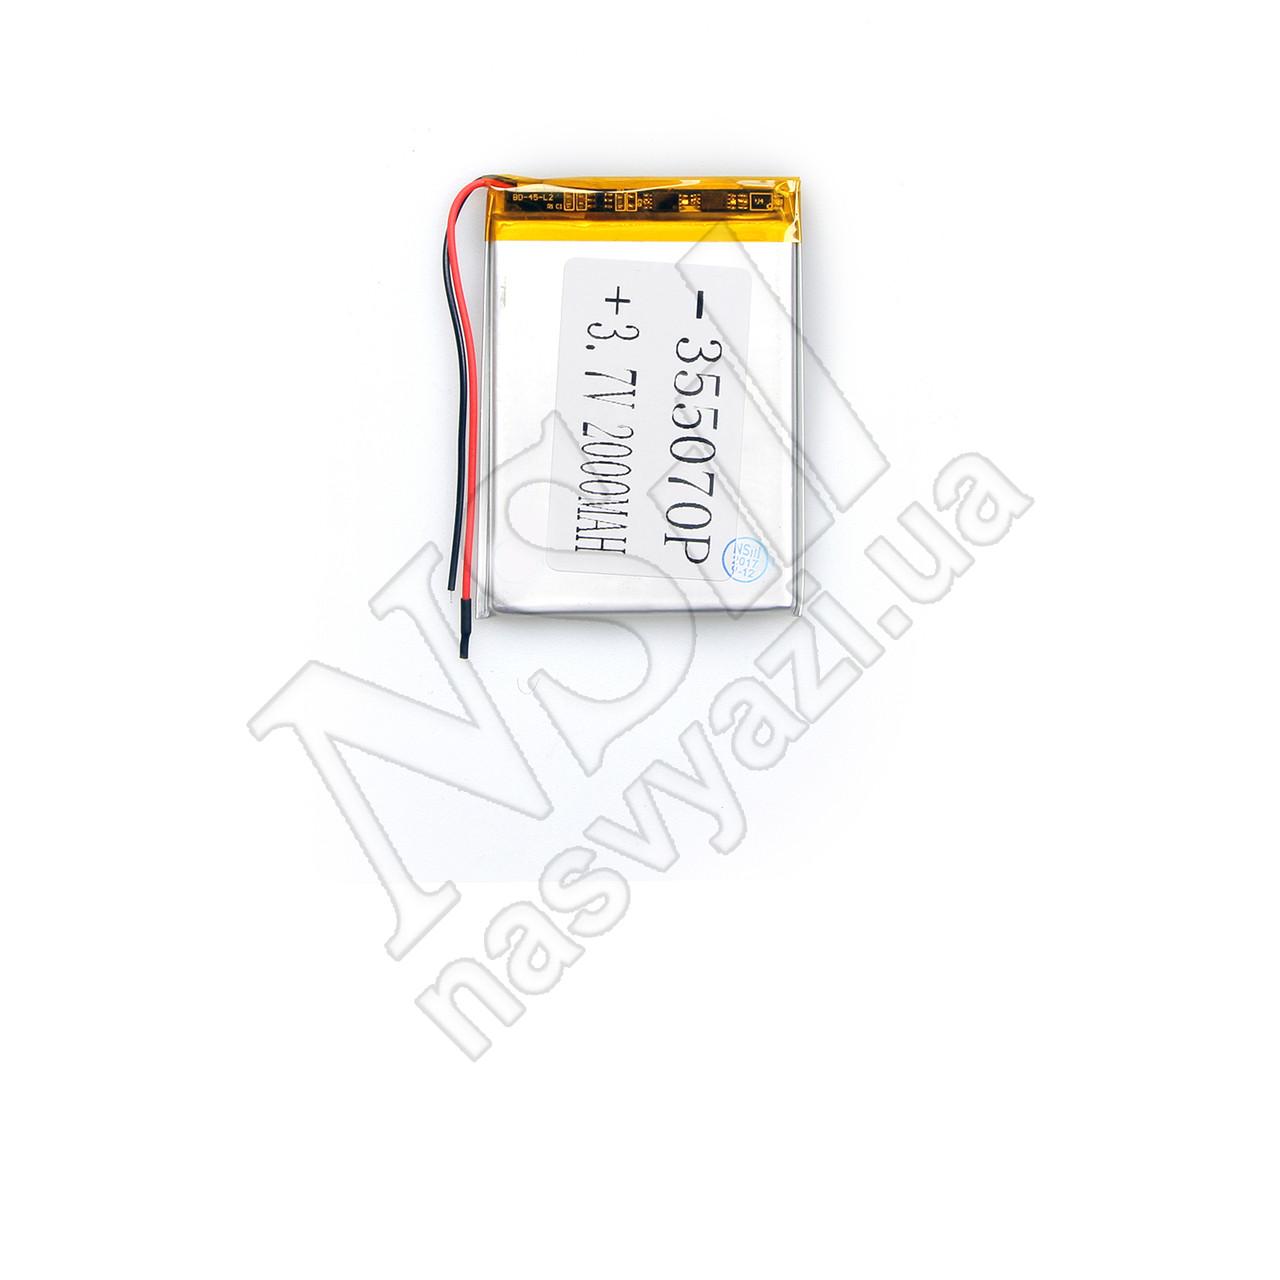 Аккумулятор 3.5*50*70 (2000mAh 3,7V)